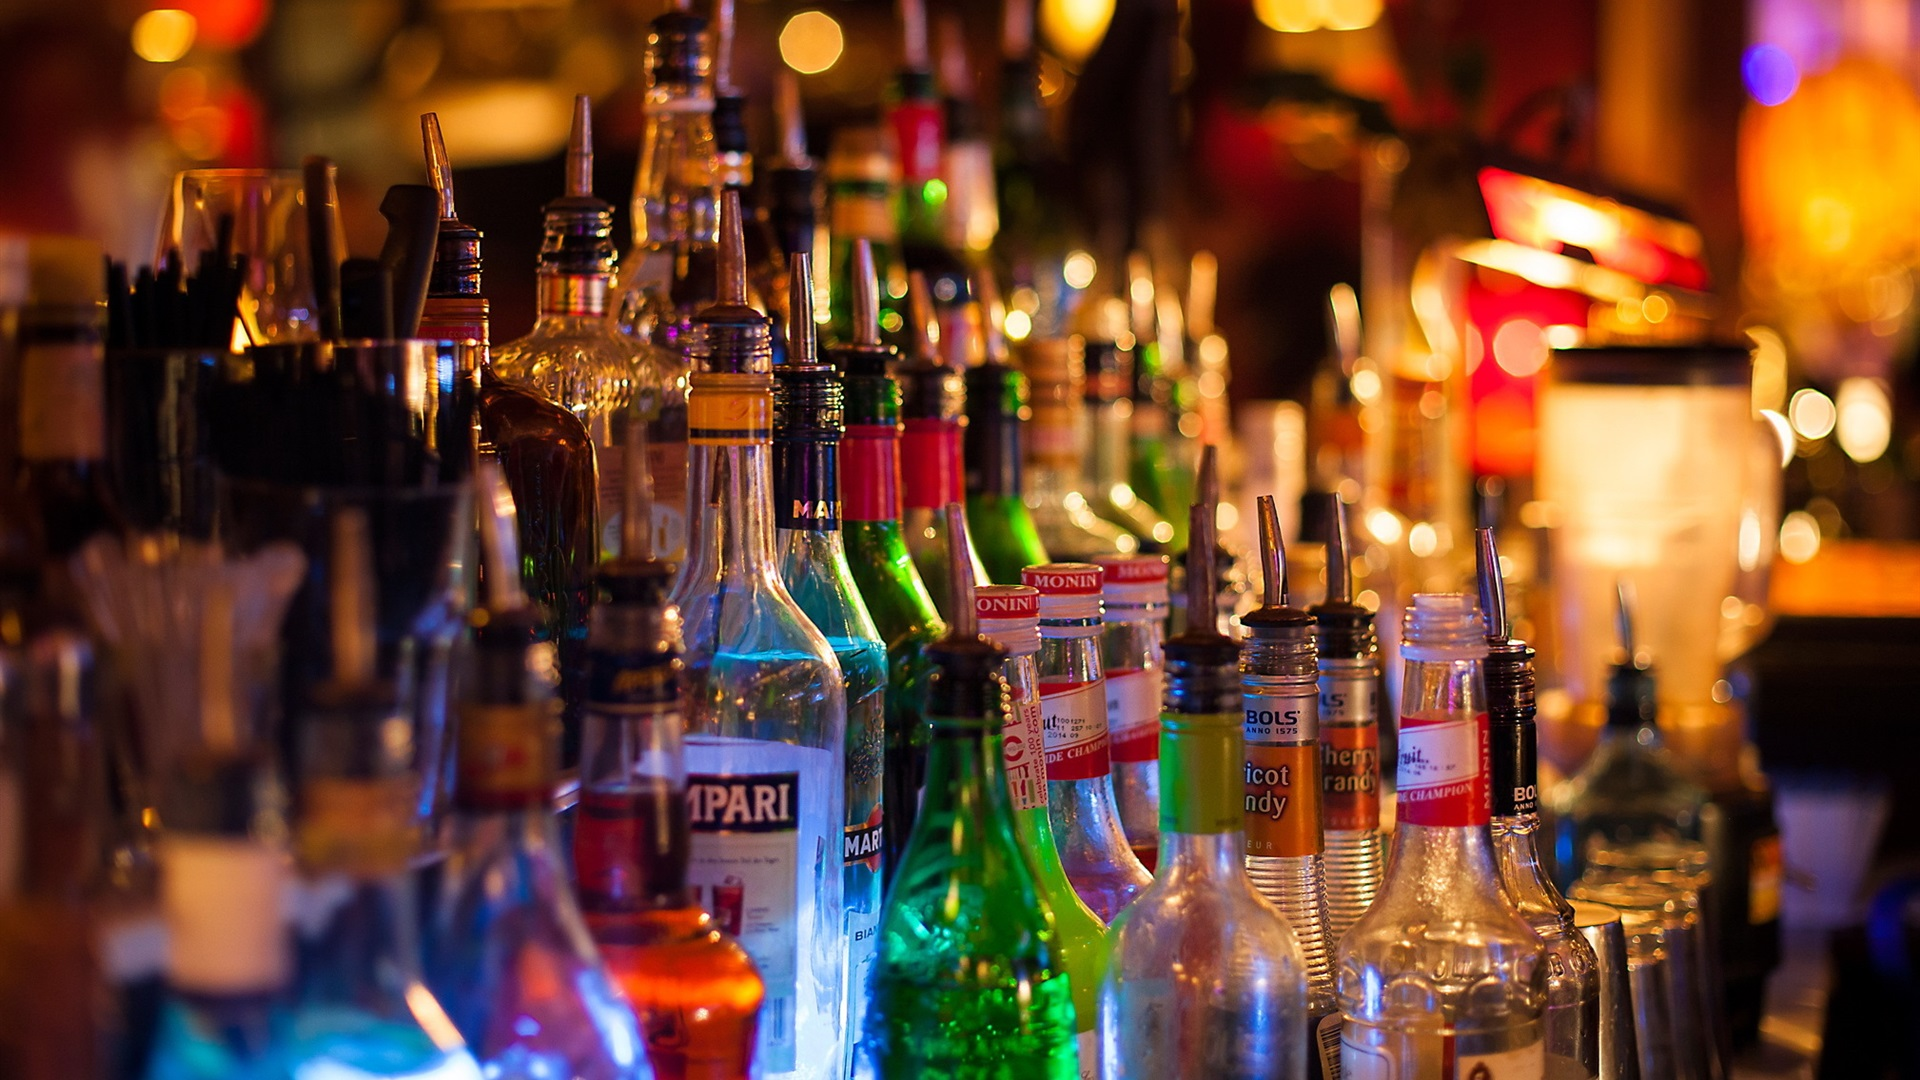 Mayorista de bebidas alcohólicas